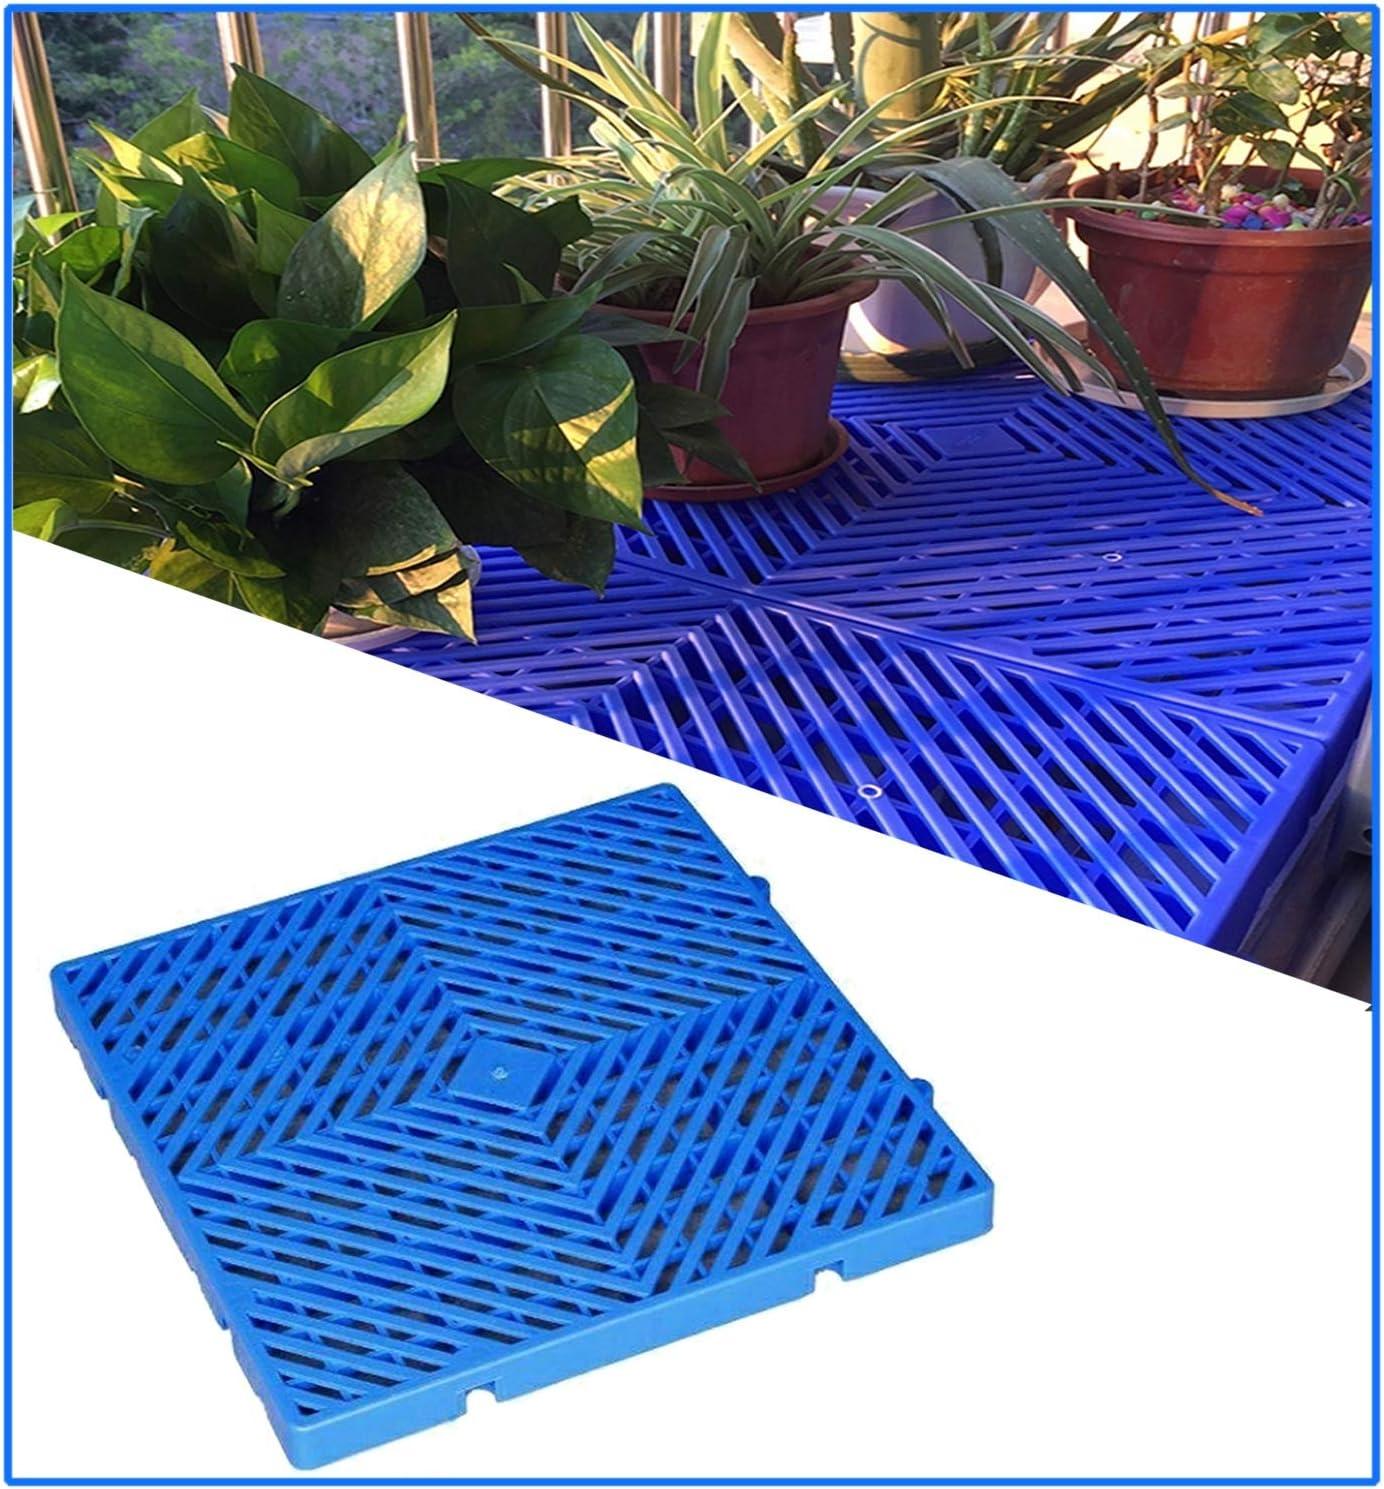 LIANGJUN 5% OFF Plastic Pallets Storage Pad Cash special price Grid Polyethylene Waterpro